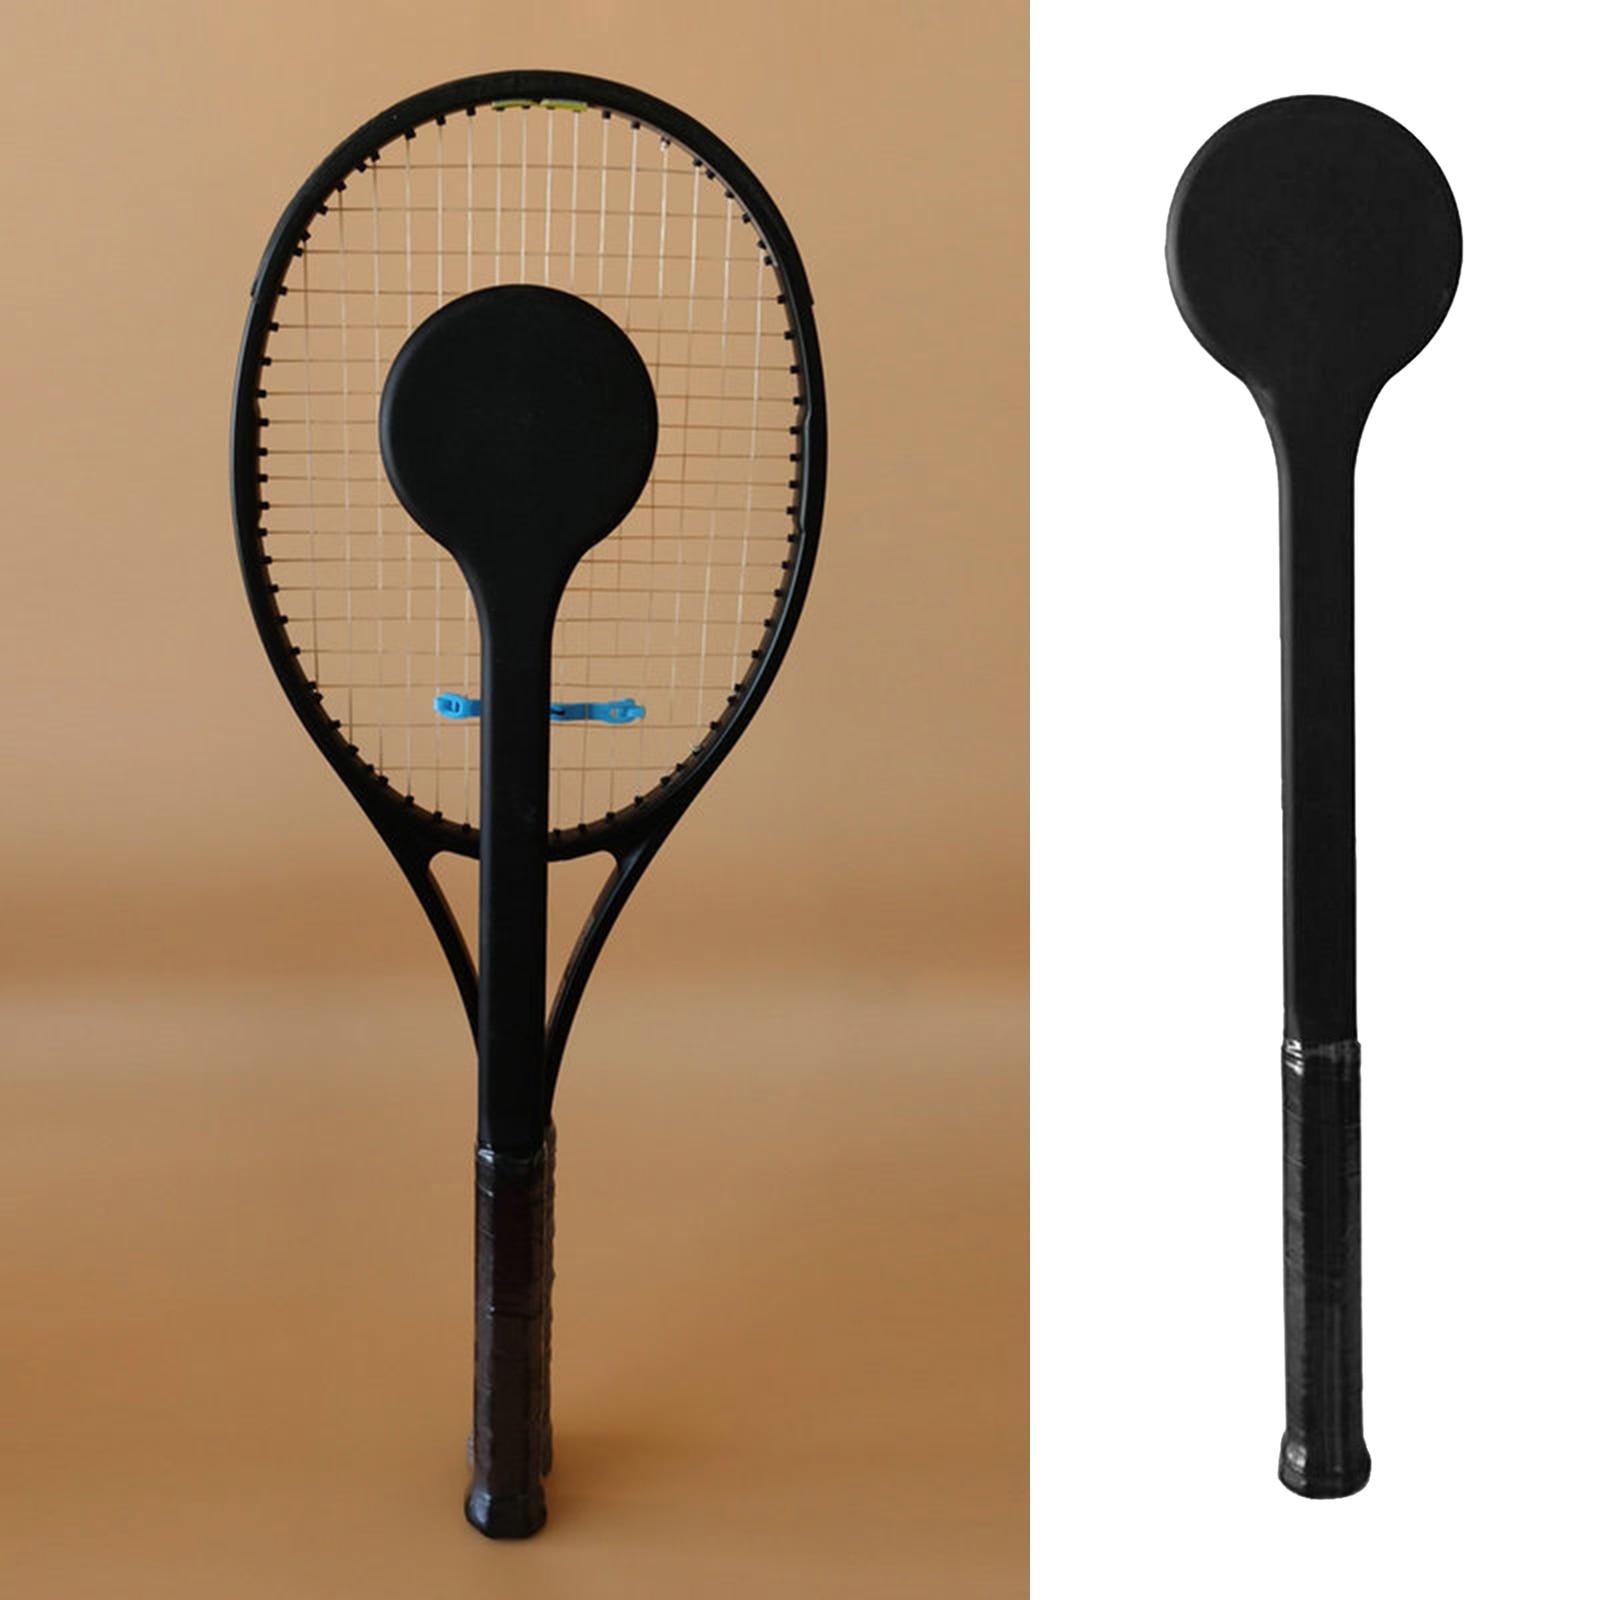 Carbon Fiber Tennis Sweet Spot Racket Spoon Swing Training Racket Accuracy Practice Racket Batting Hitting Equipment